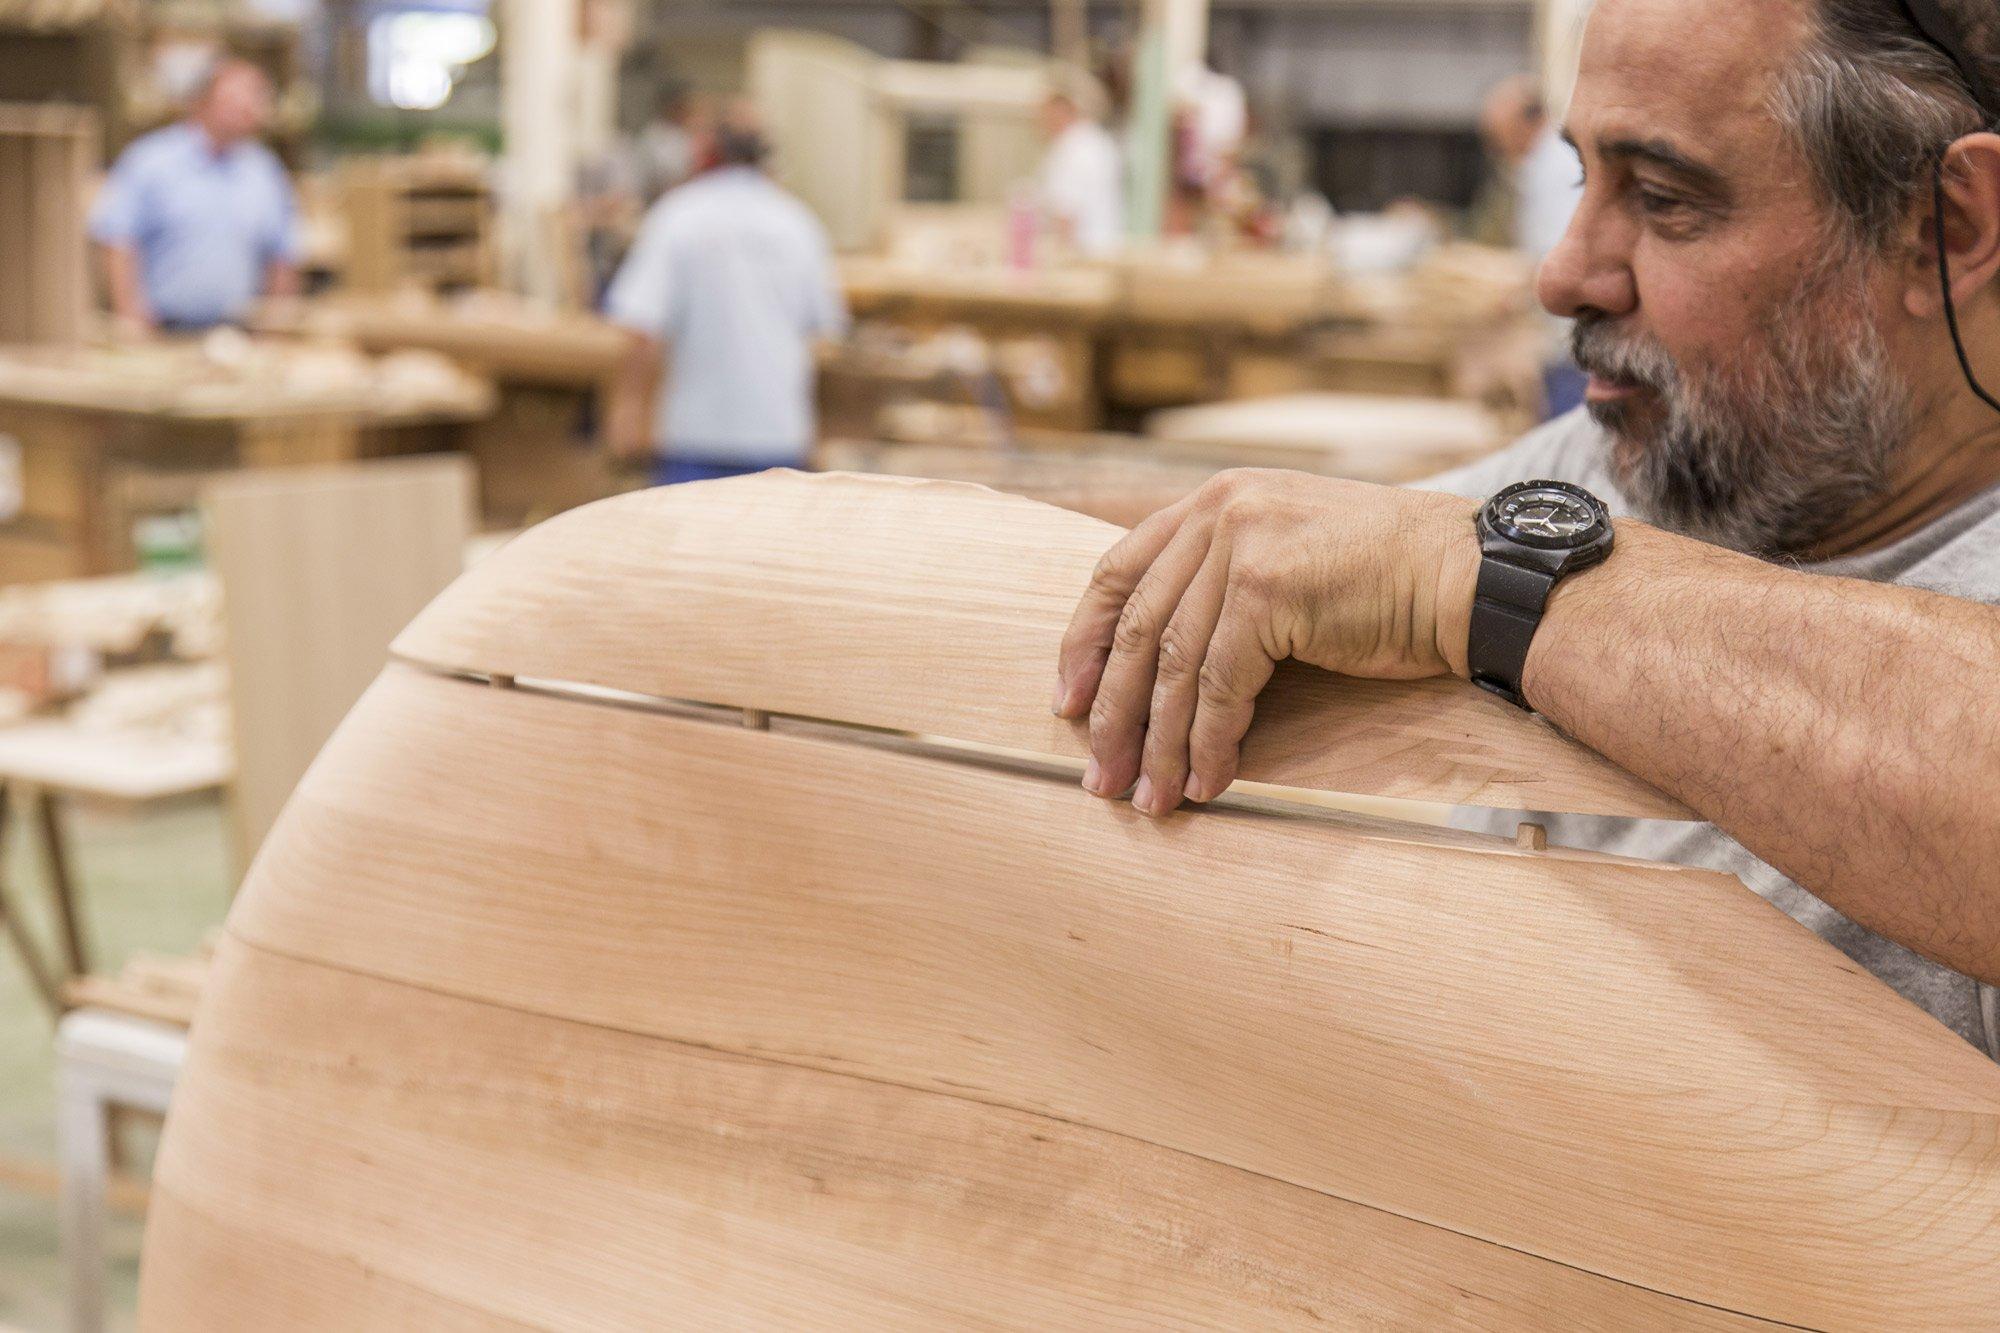 Carpenter at La Navarra assembling the American cherry pieces of Lounge Chair © Uxío Da Vila